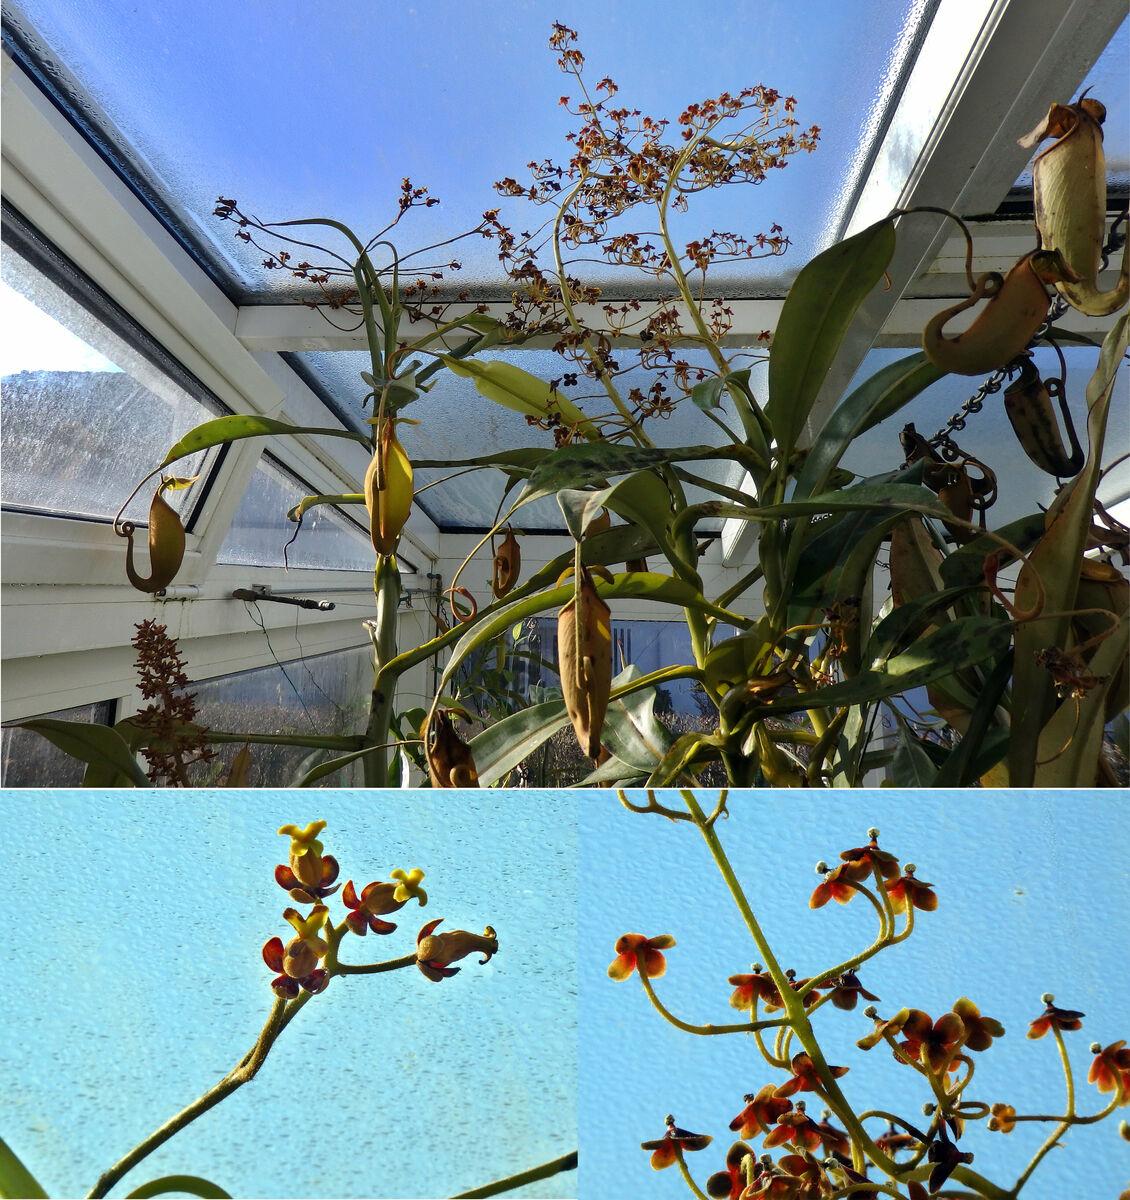 Nepenthes_bicalcarata_Paar_Collage-full_160120.thumb.jpg.22418c3437b1ec28fa3ca153bfb1217b.jpg